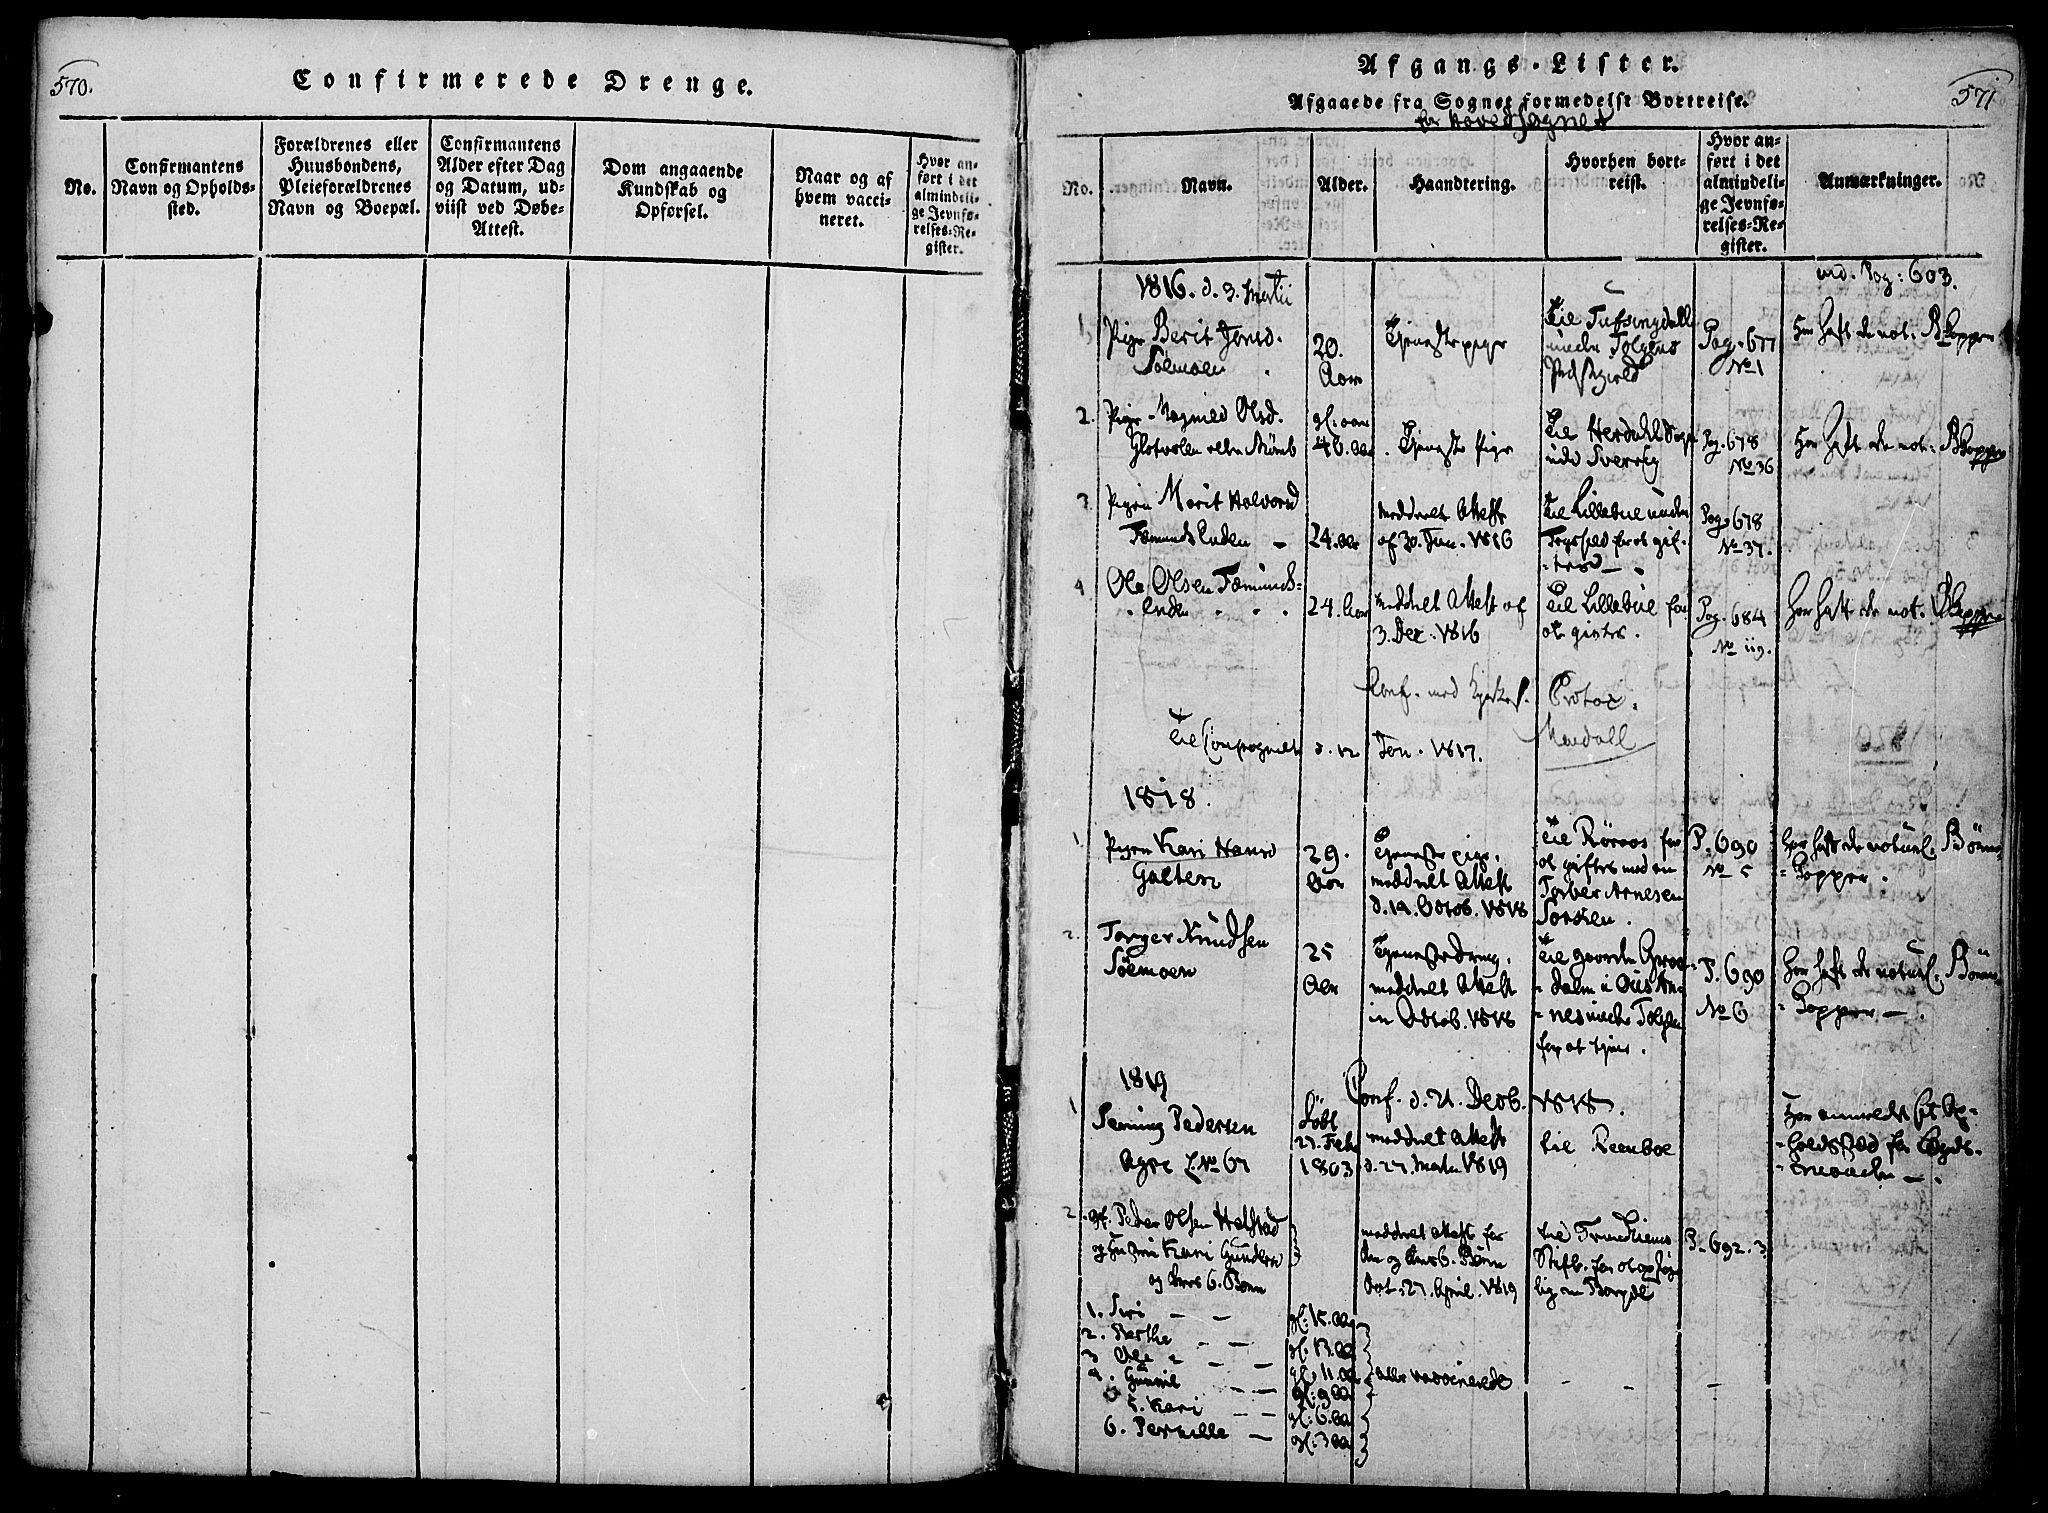 SAH, Rendalen prestekontor, H/Ha/Haa/L0003: Ministerialbok nr. 3, 1815-1829, s. 570-571